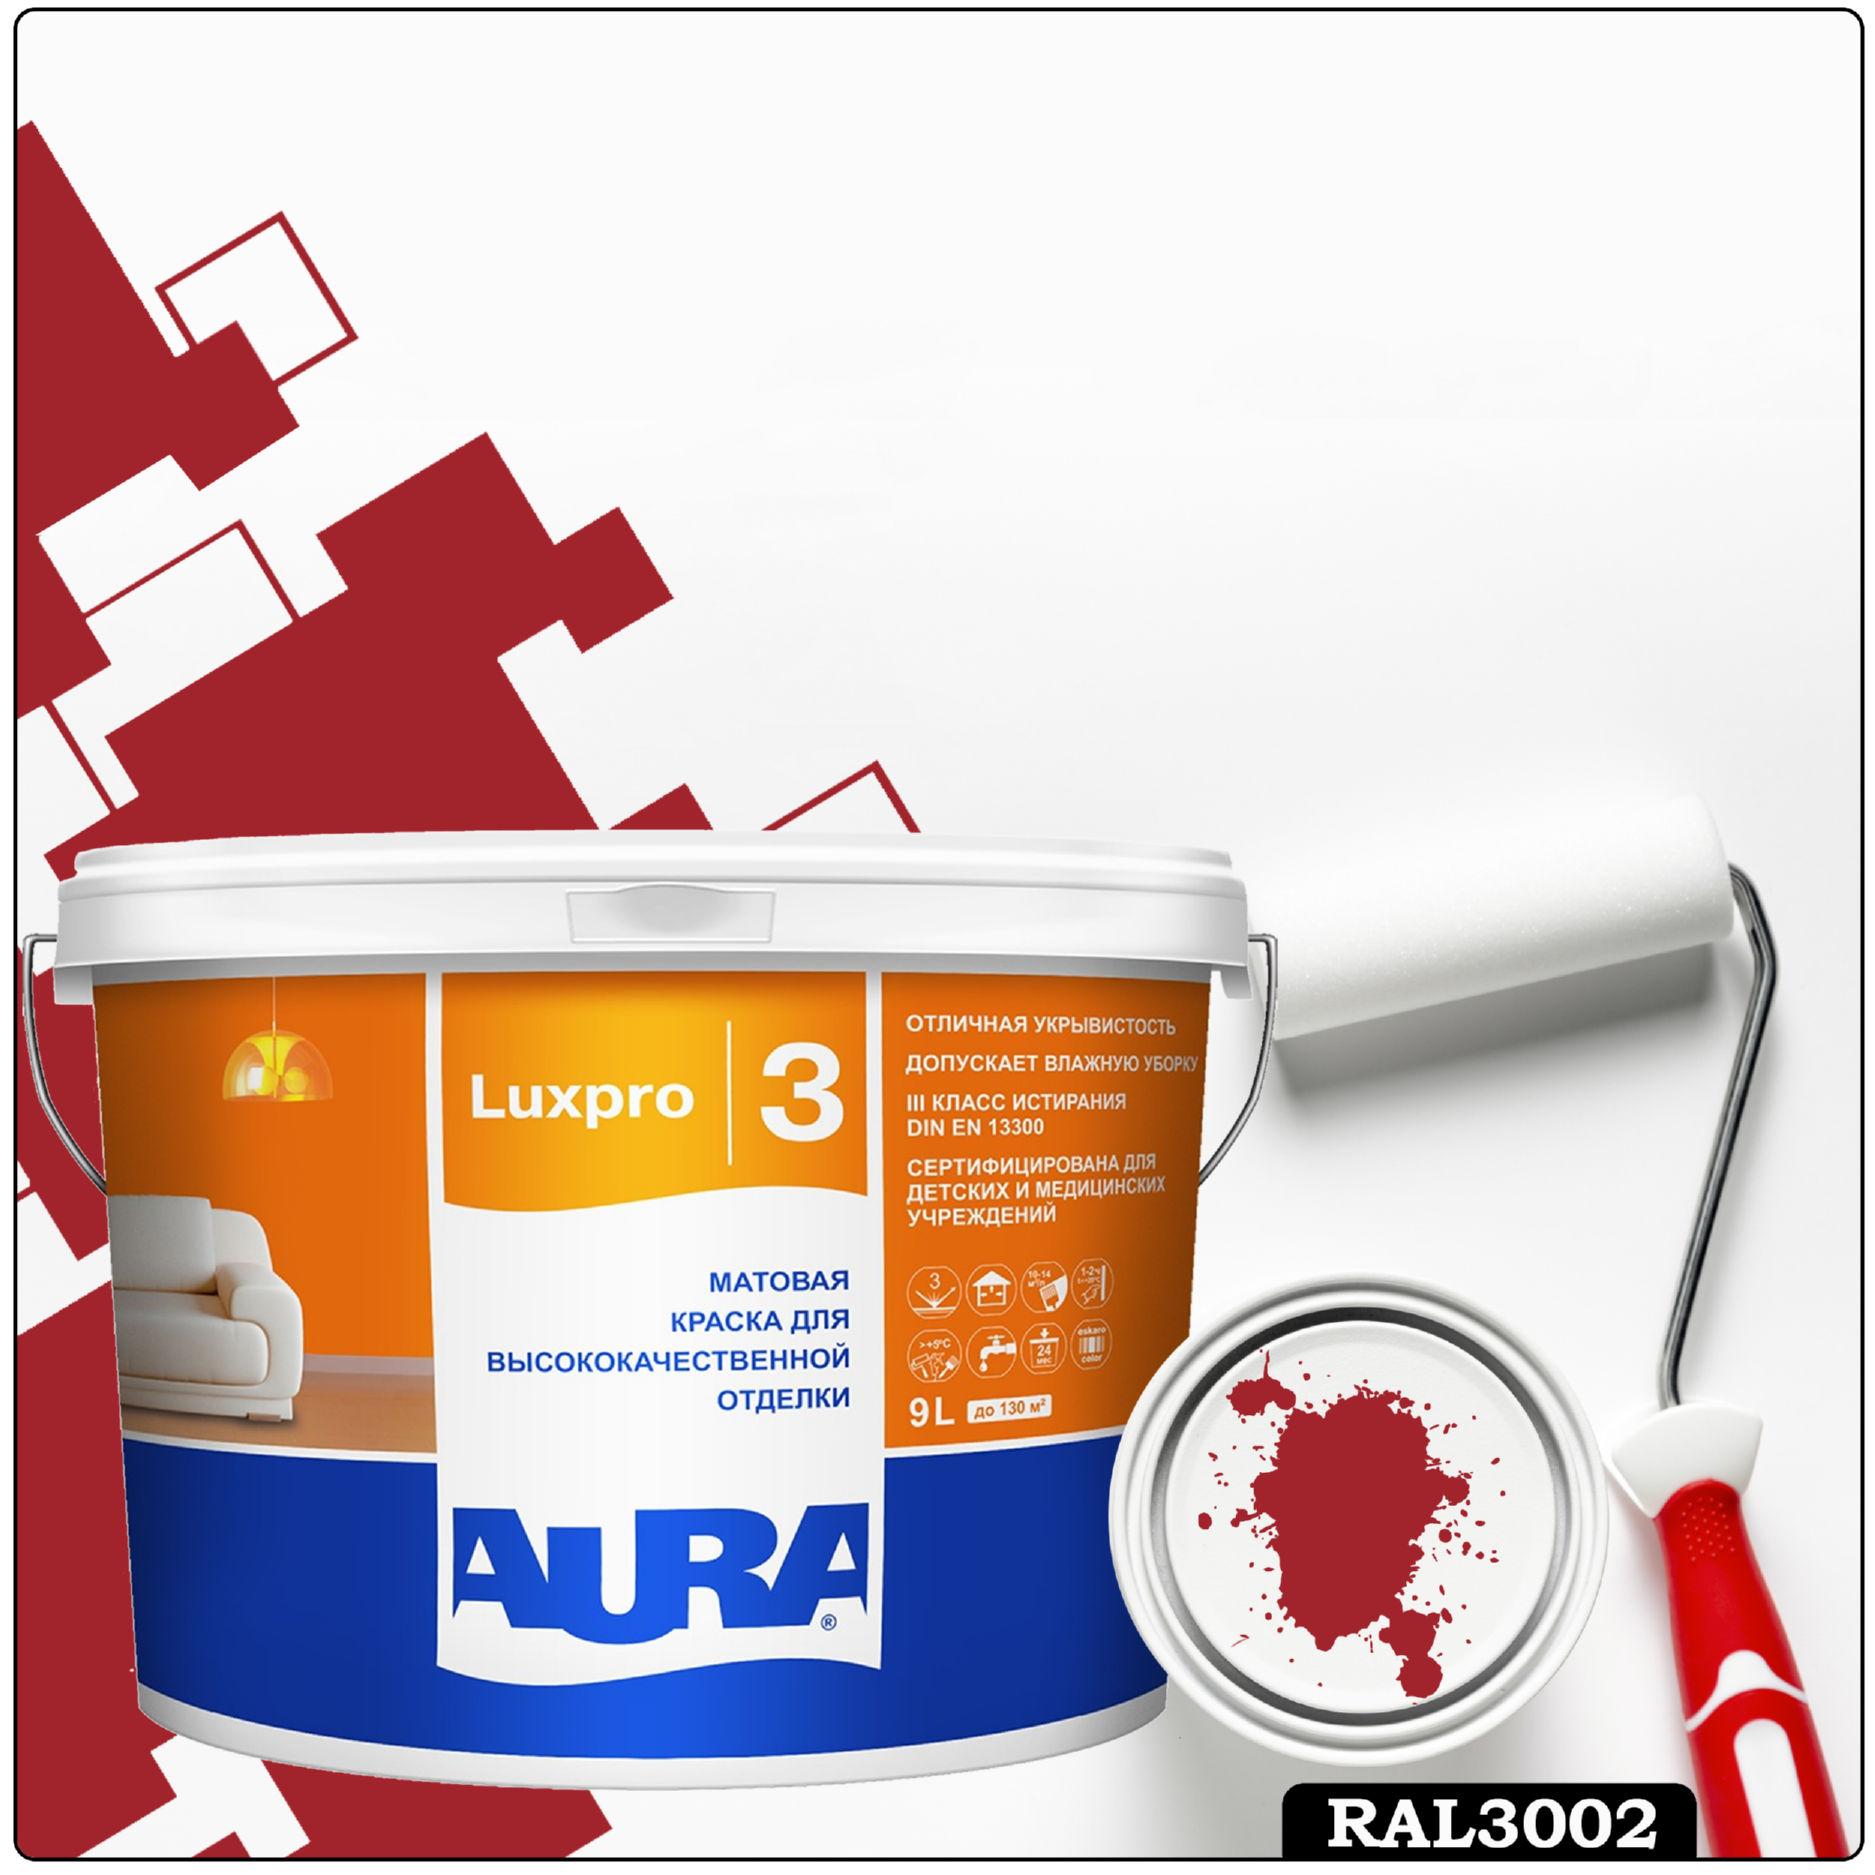 Фото 2 - Краска Aura LuxPRO 3, RAL 3002 Карминно-красный, латексная, шелково-матовая, интерьерная, 9л, Аура.